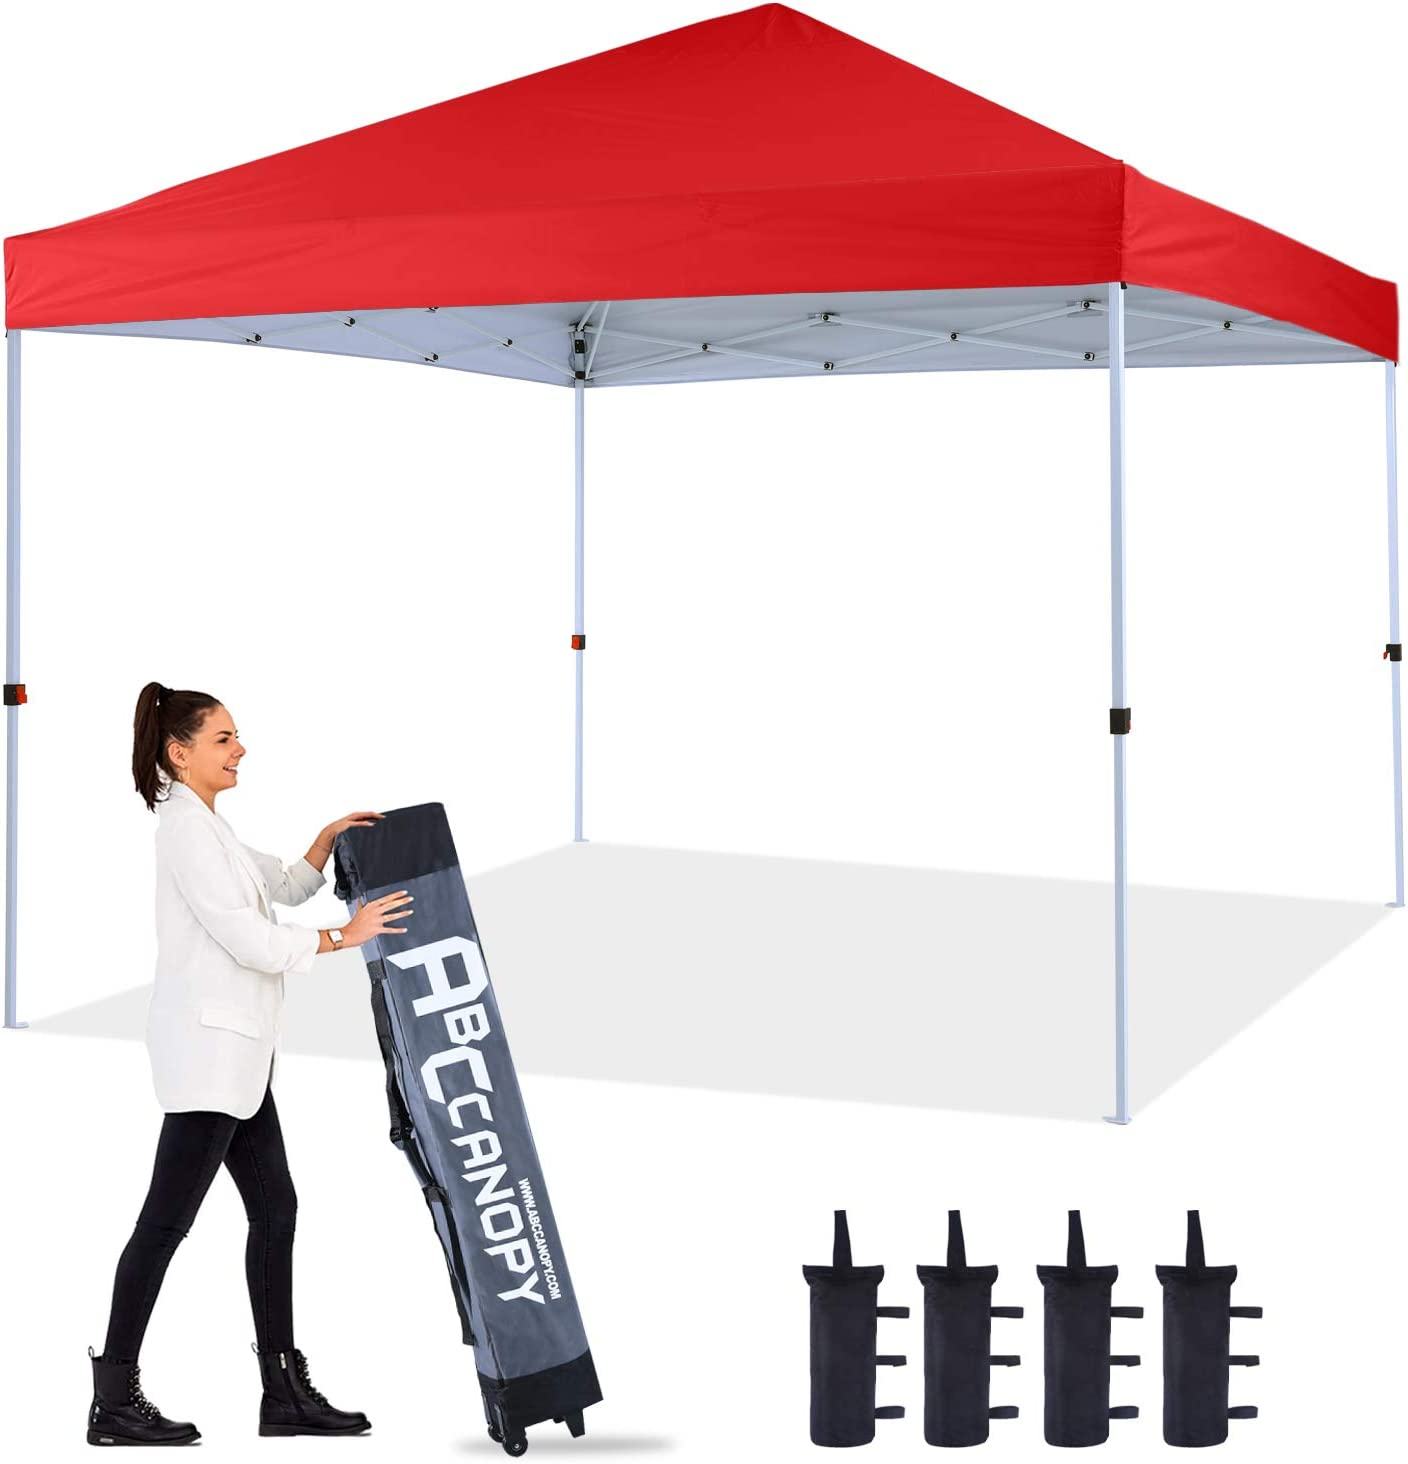 ABCCANOPY 10'x10' Pop up Canopy Instant Outdoor Tent Instant Shelter, Bonus Wheel Bag, Red